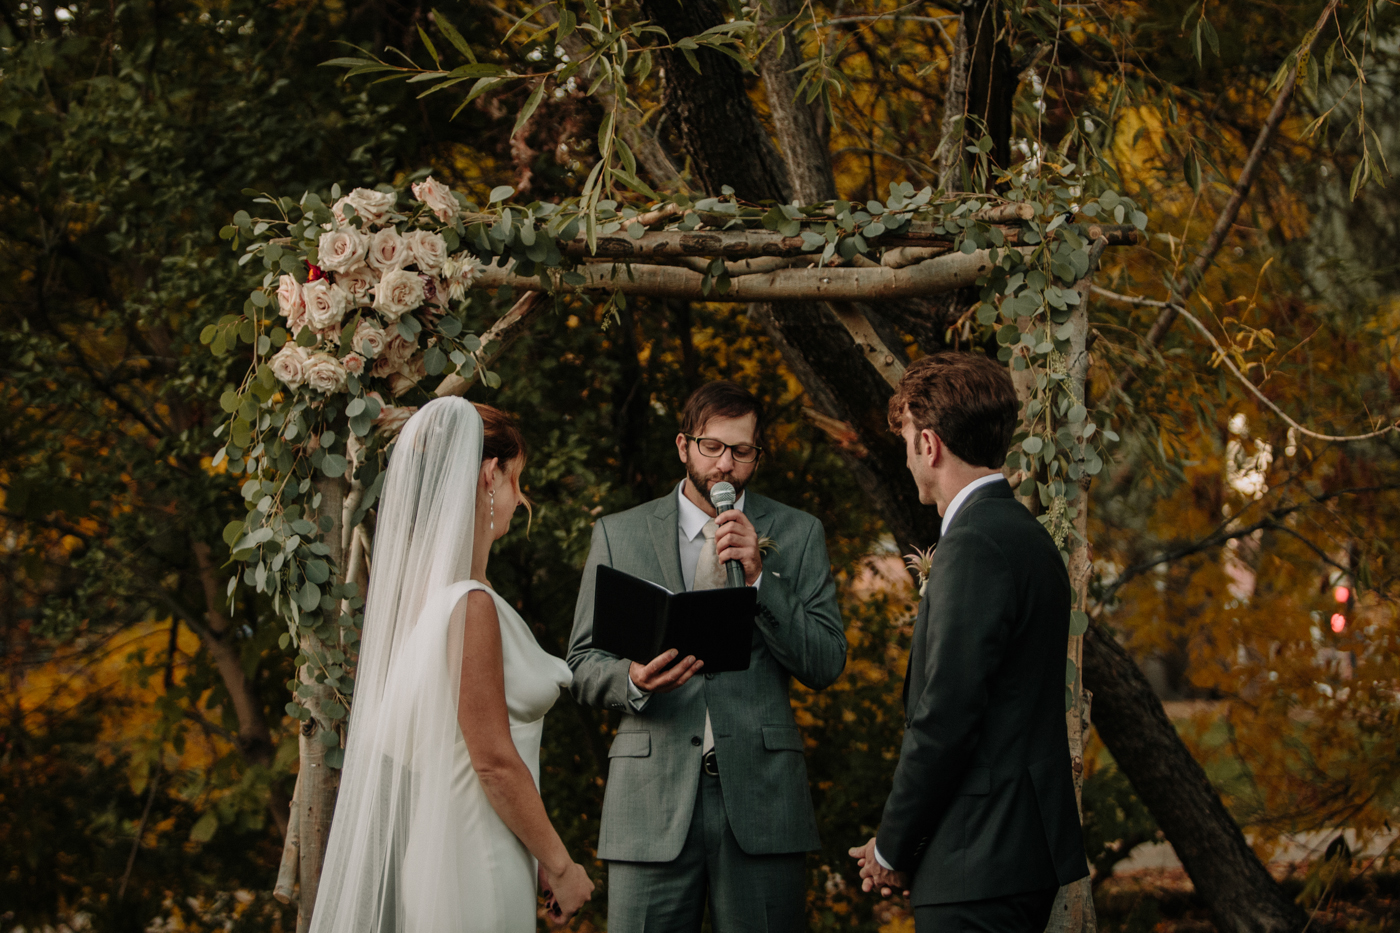 boulder-museum-modern-art-colorado-wedding-46.jpg